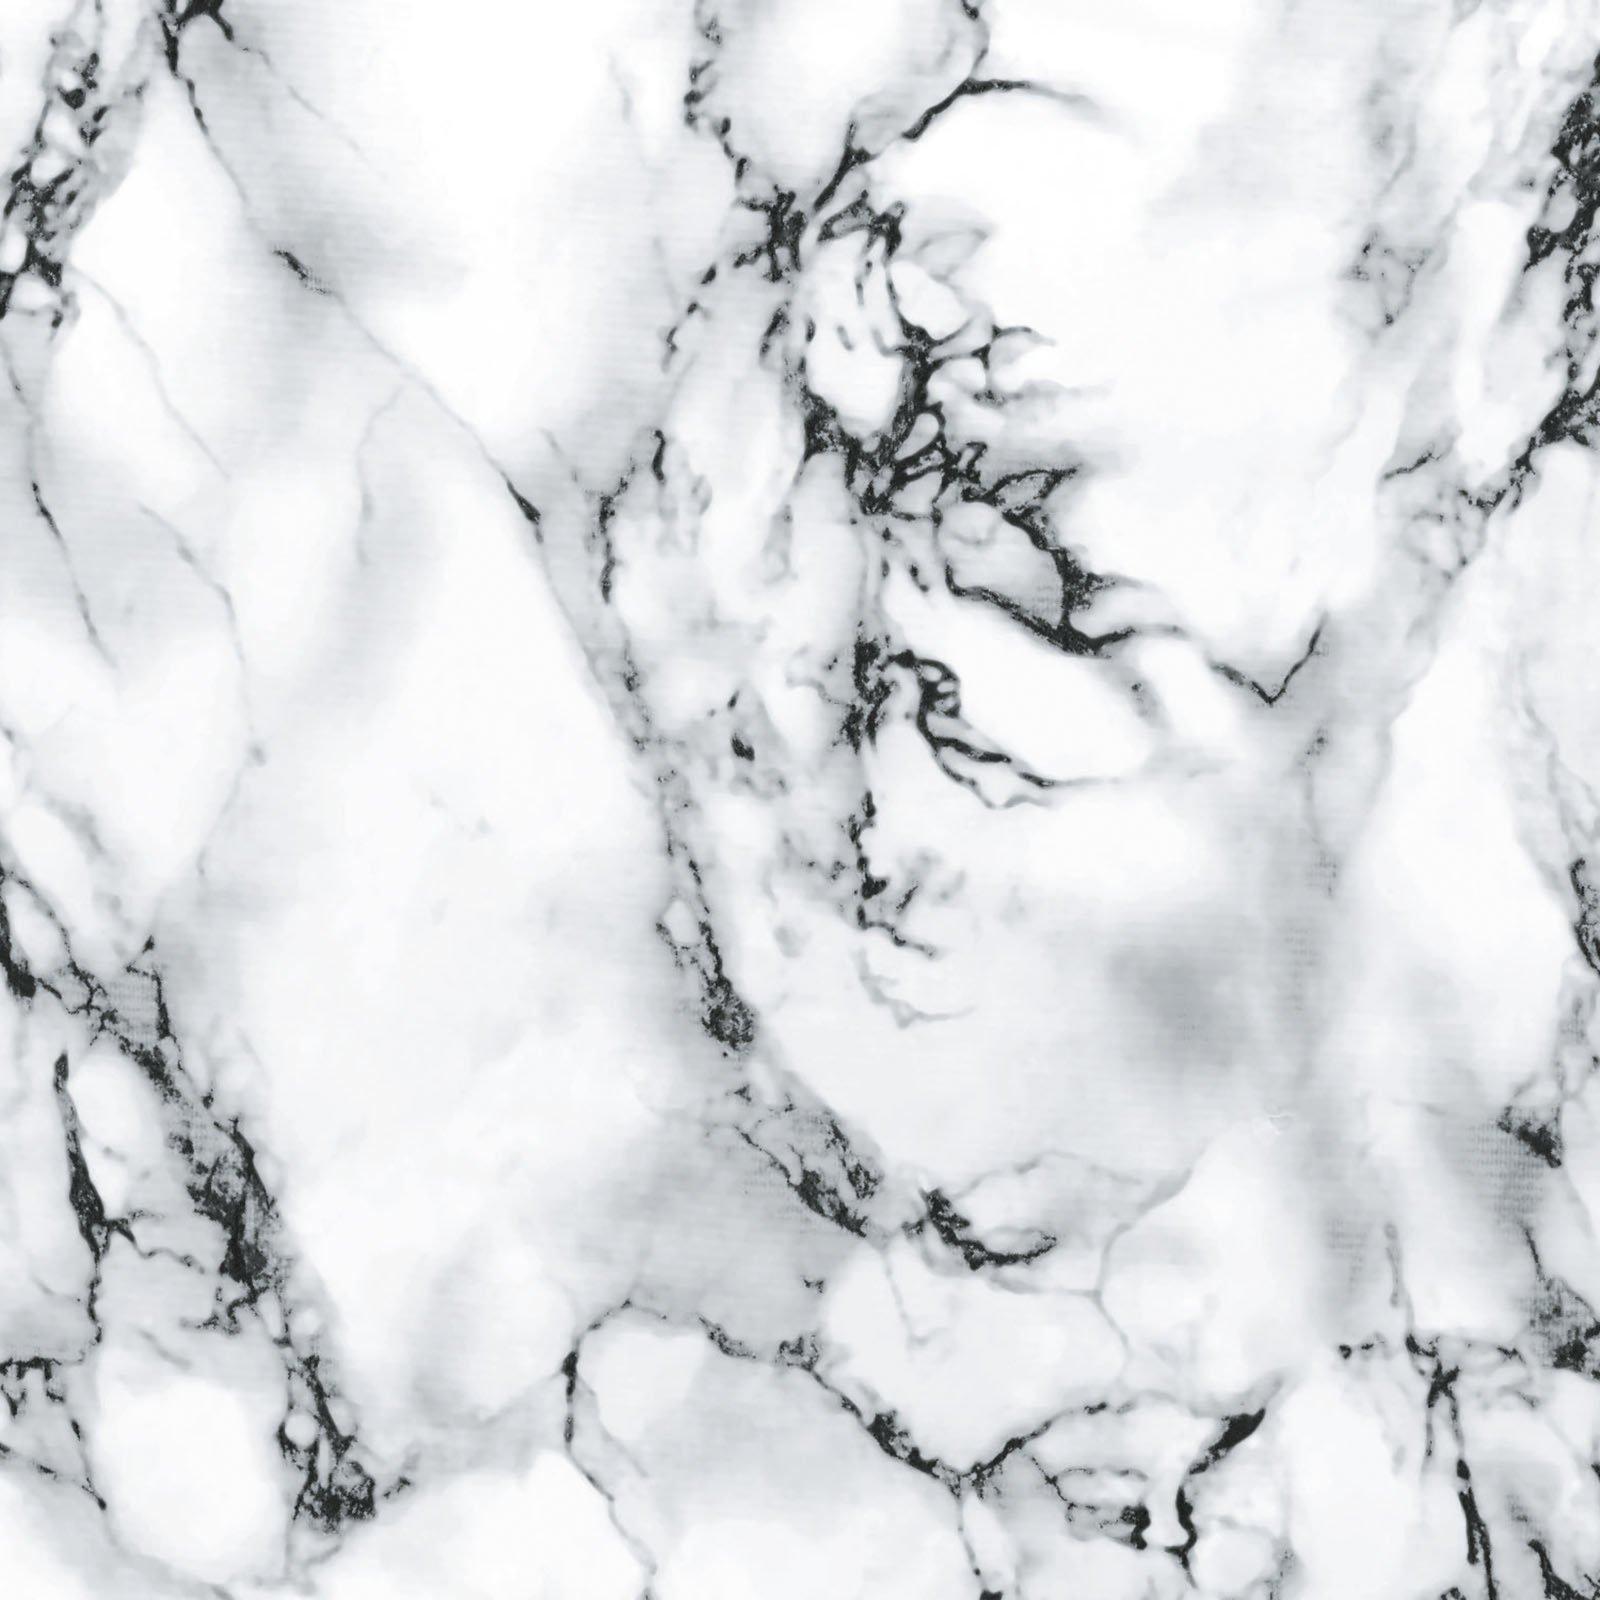 d-c fix Klebefolie - weiß-grau - Marmor - 45x200 cm